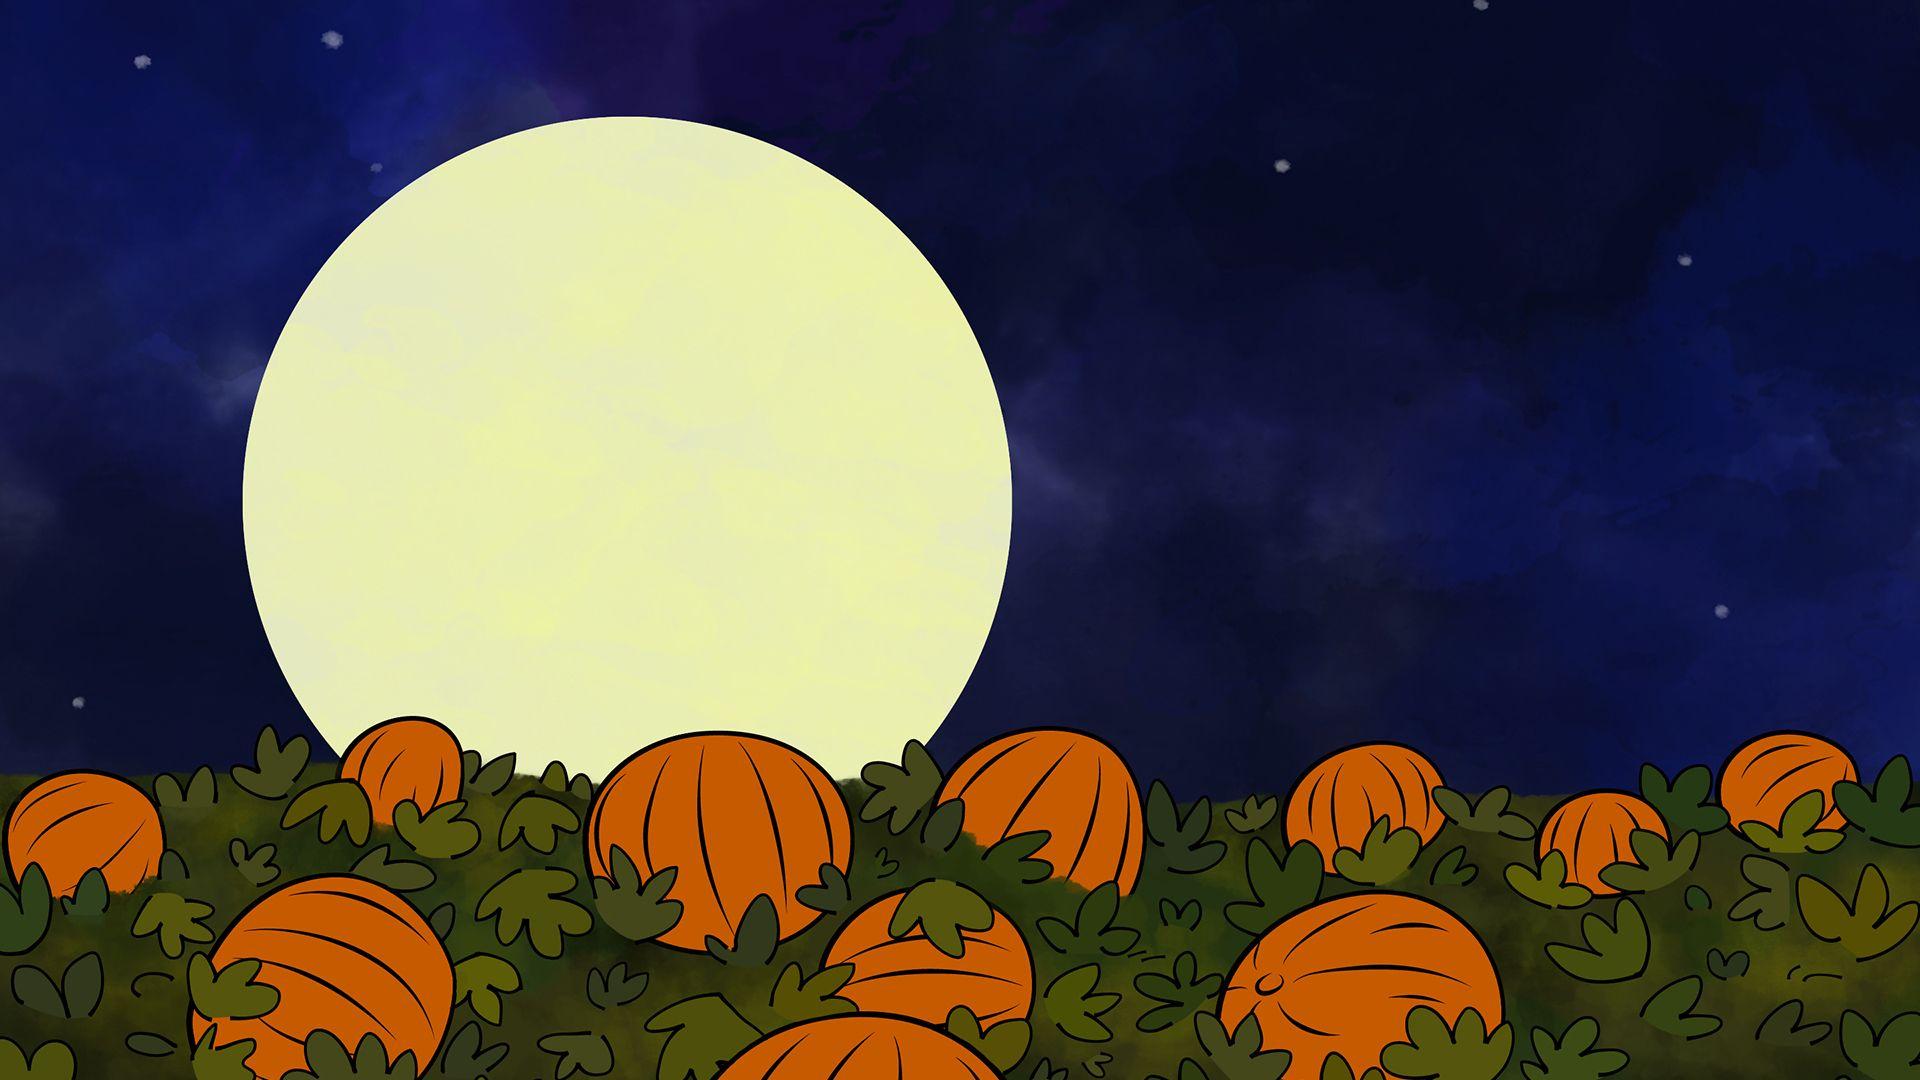 Great Pumpkin Charlie Brown Wallpaper